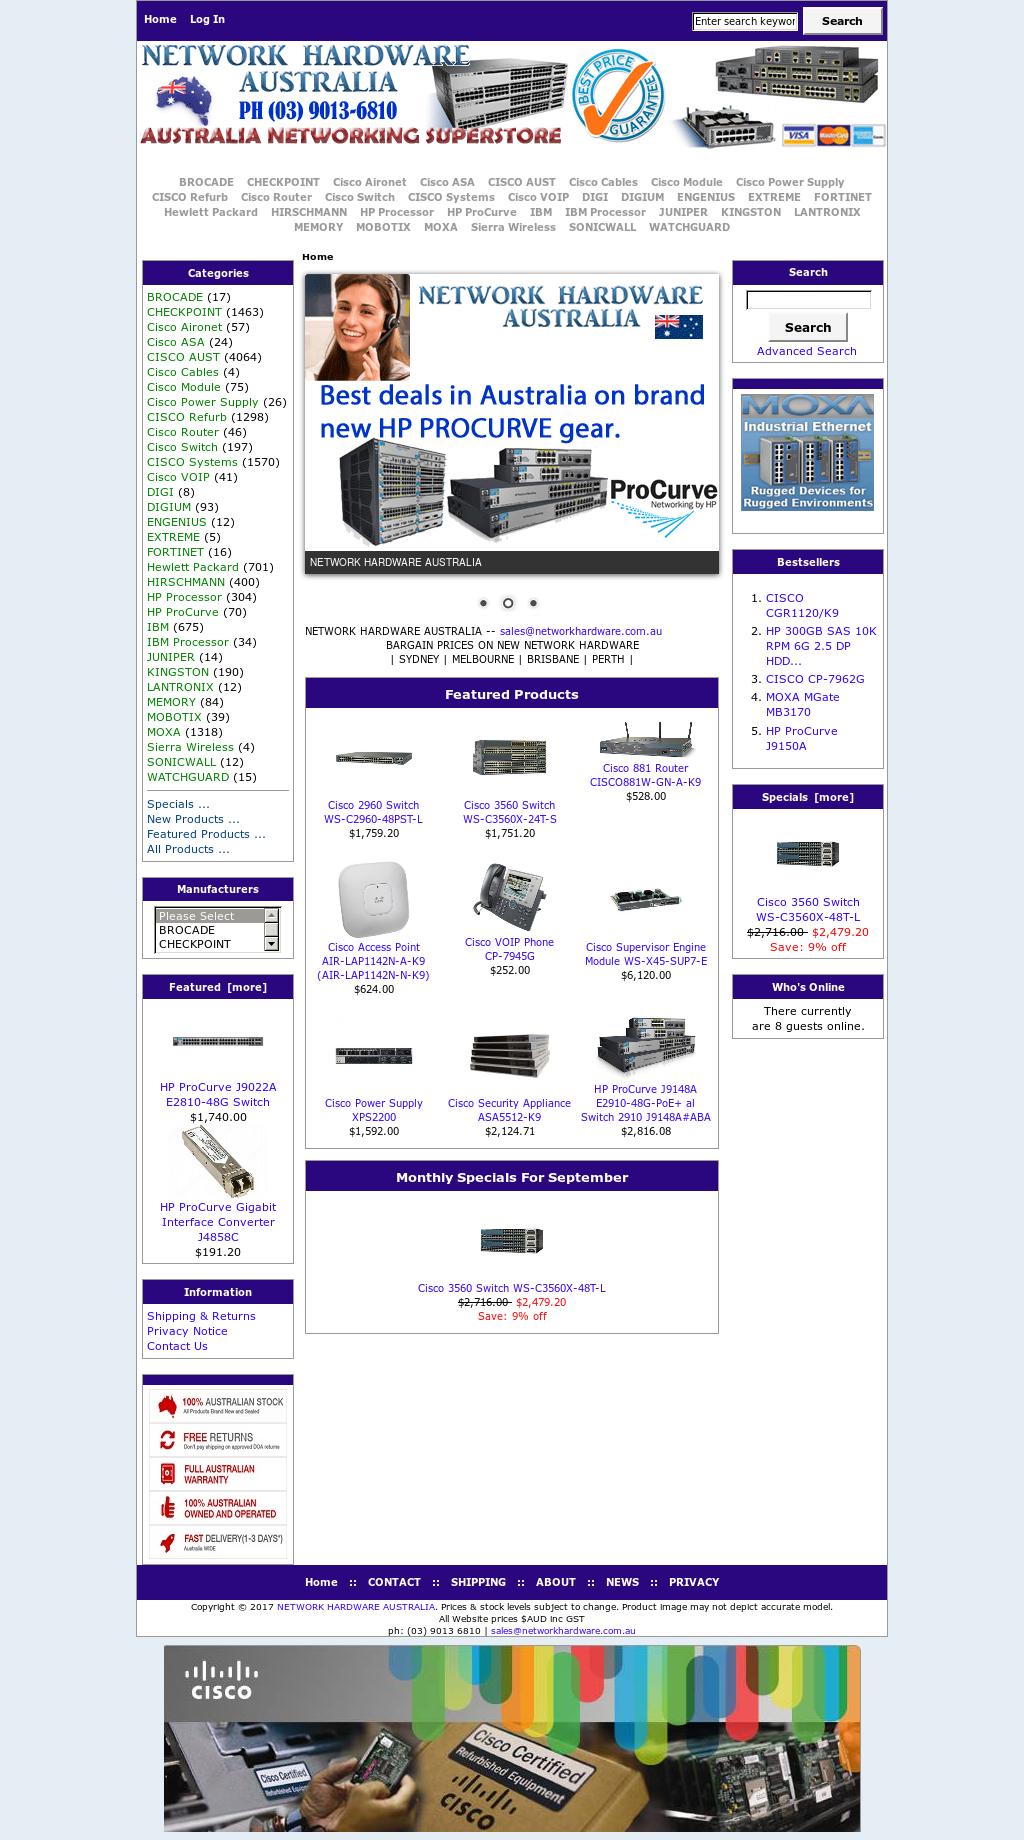 Network Hardware Australia Competitors, Revenue and Employees